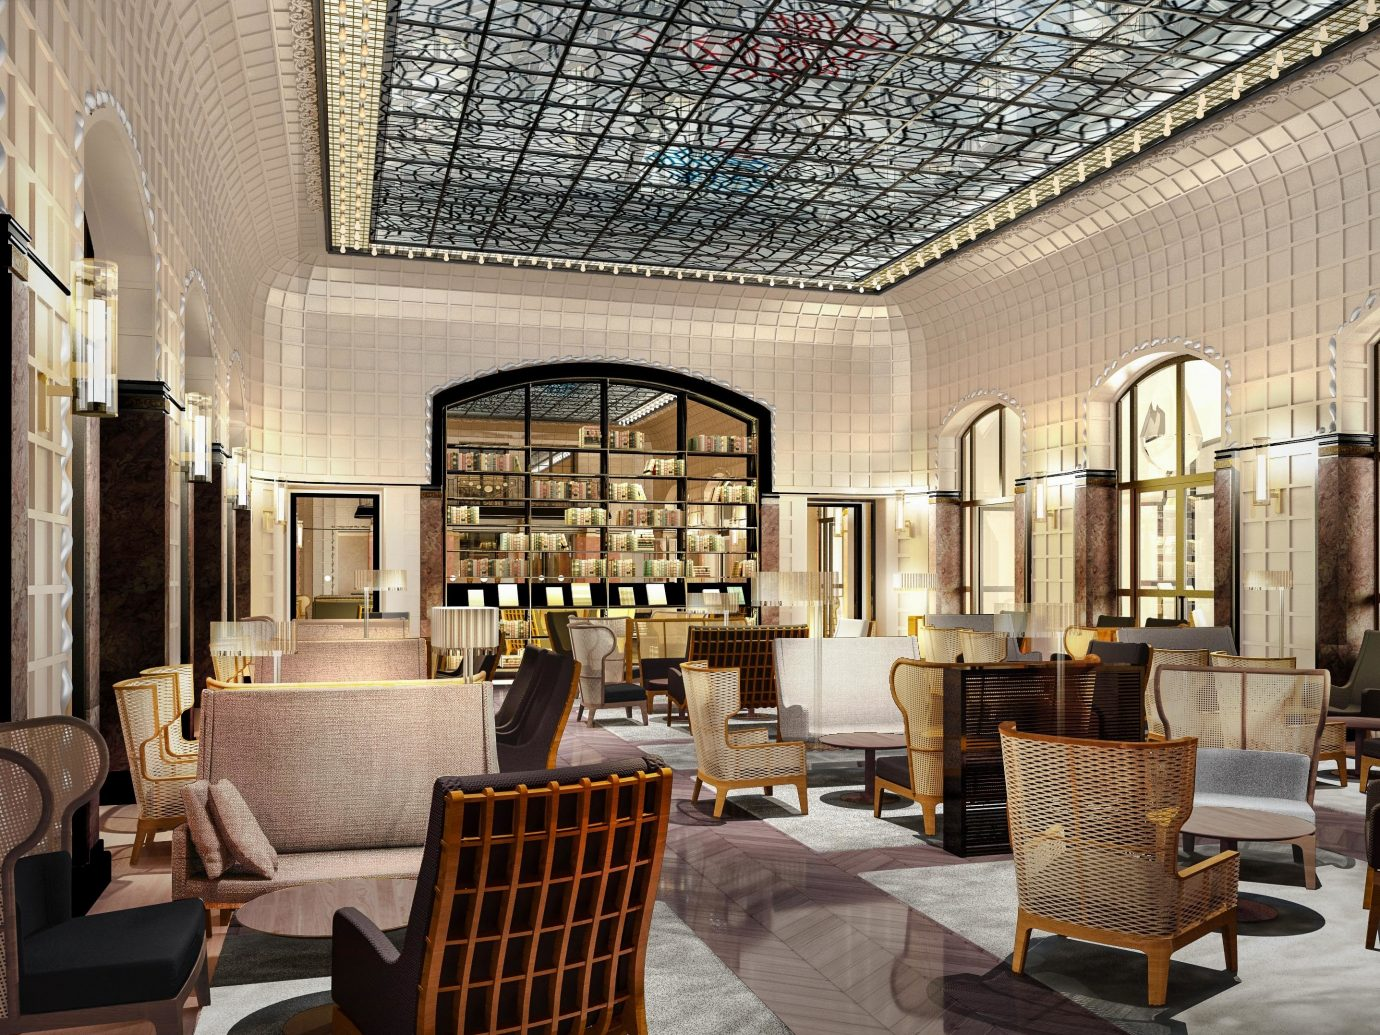 europe Trip Ideas indoor chair interior design Lobby room ceiling furniture living room area